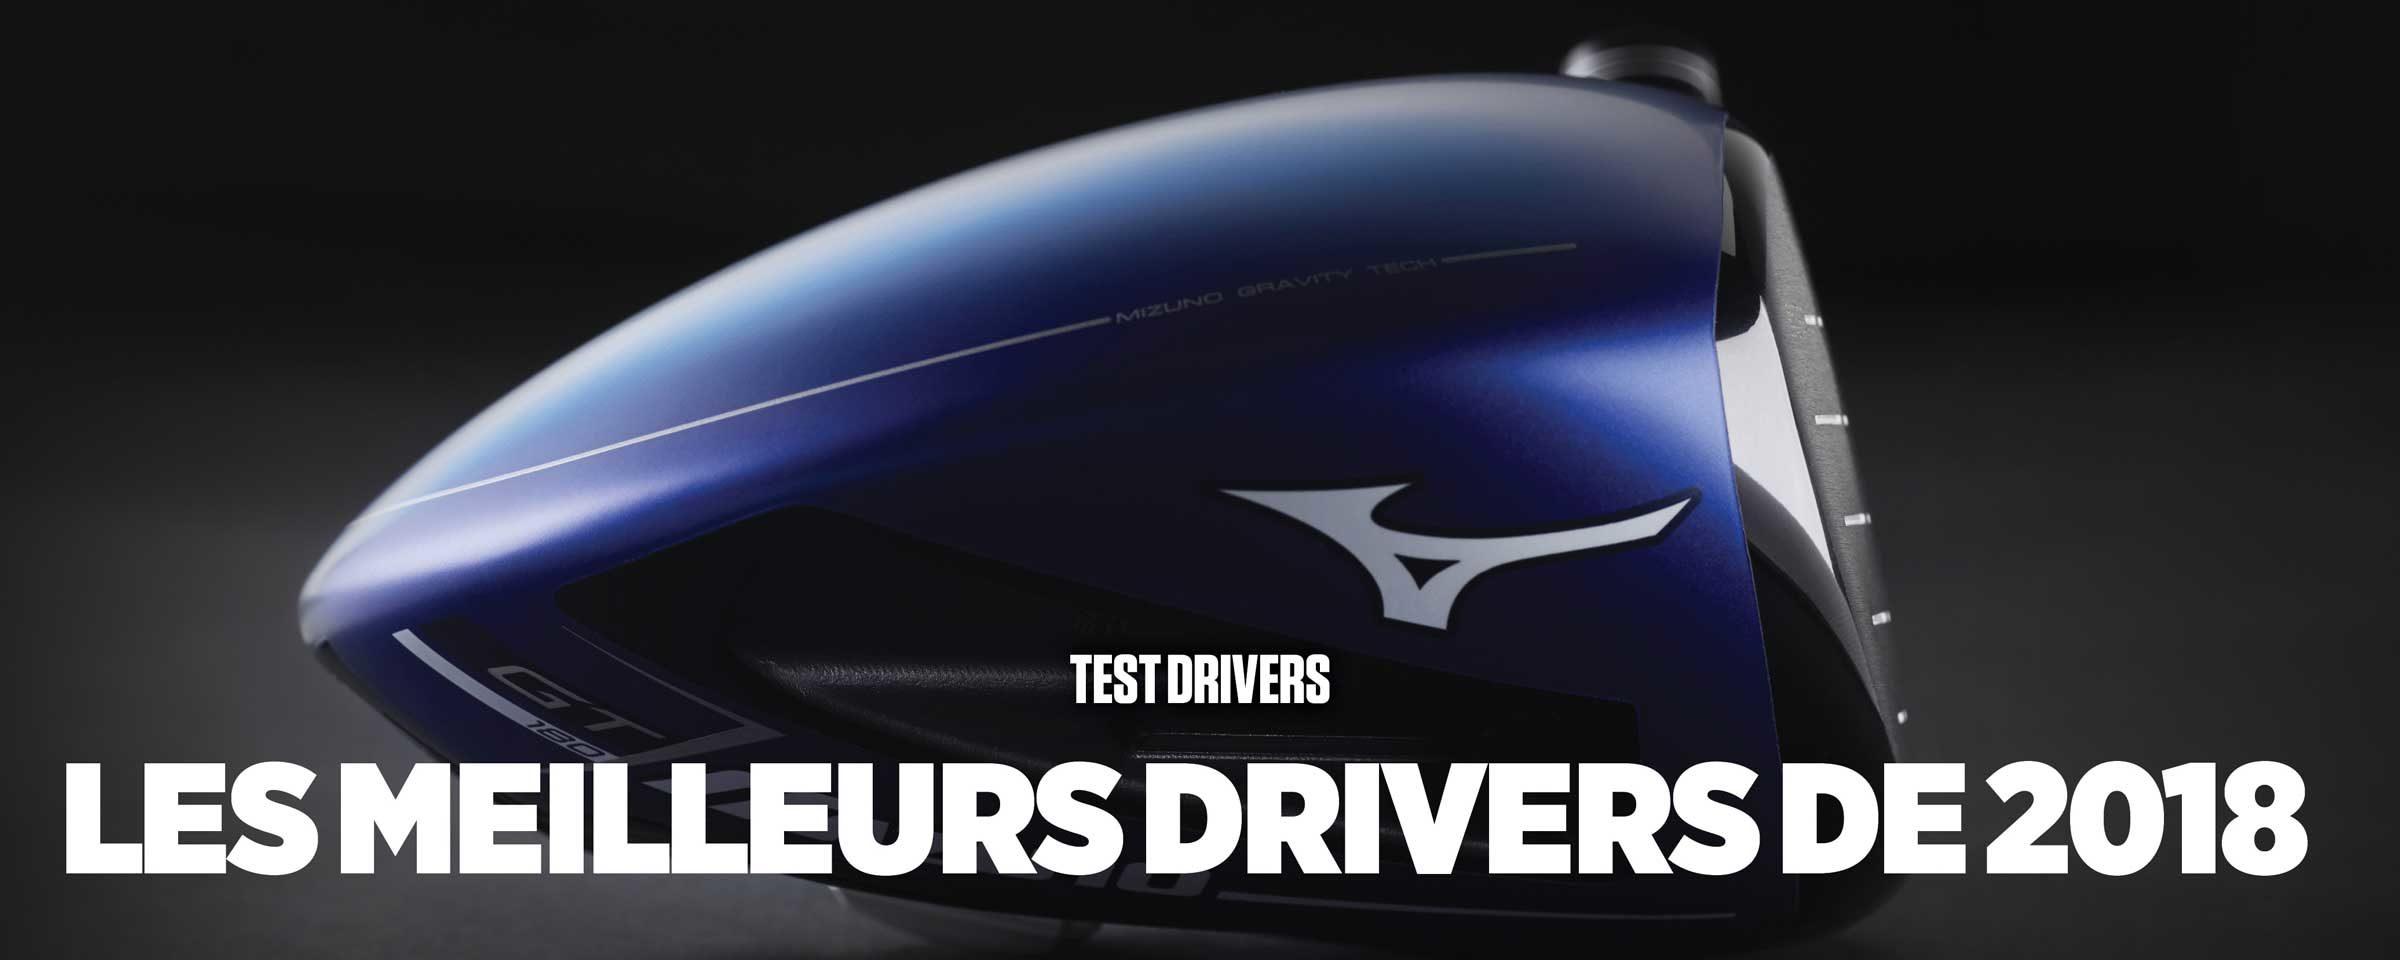 Test drivers